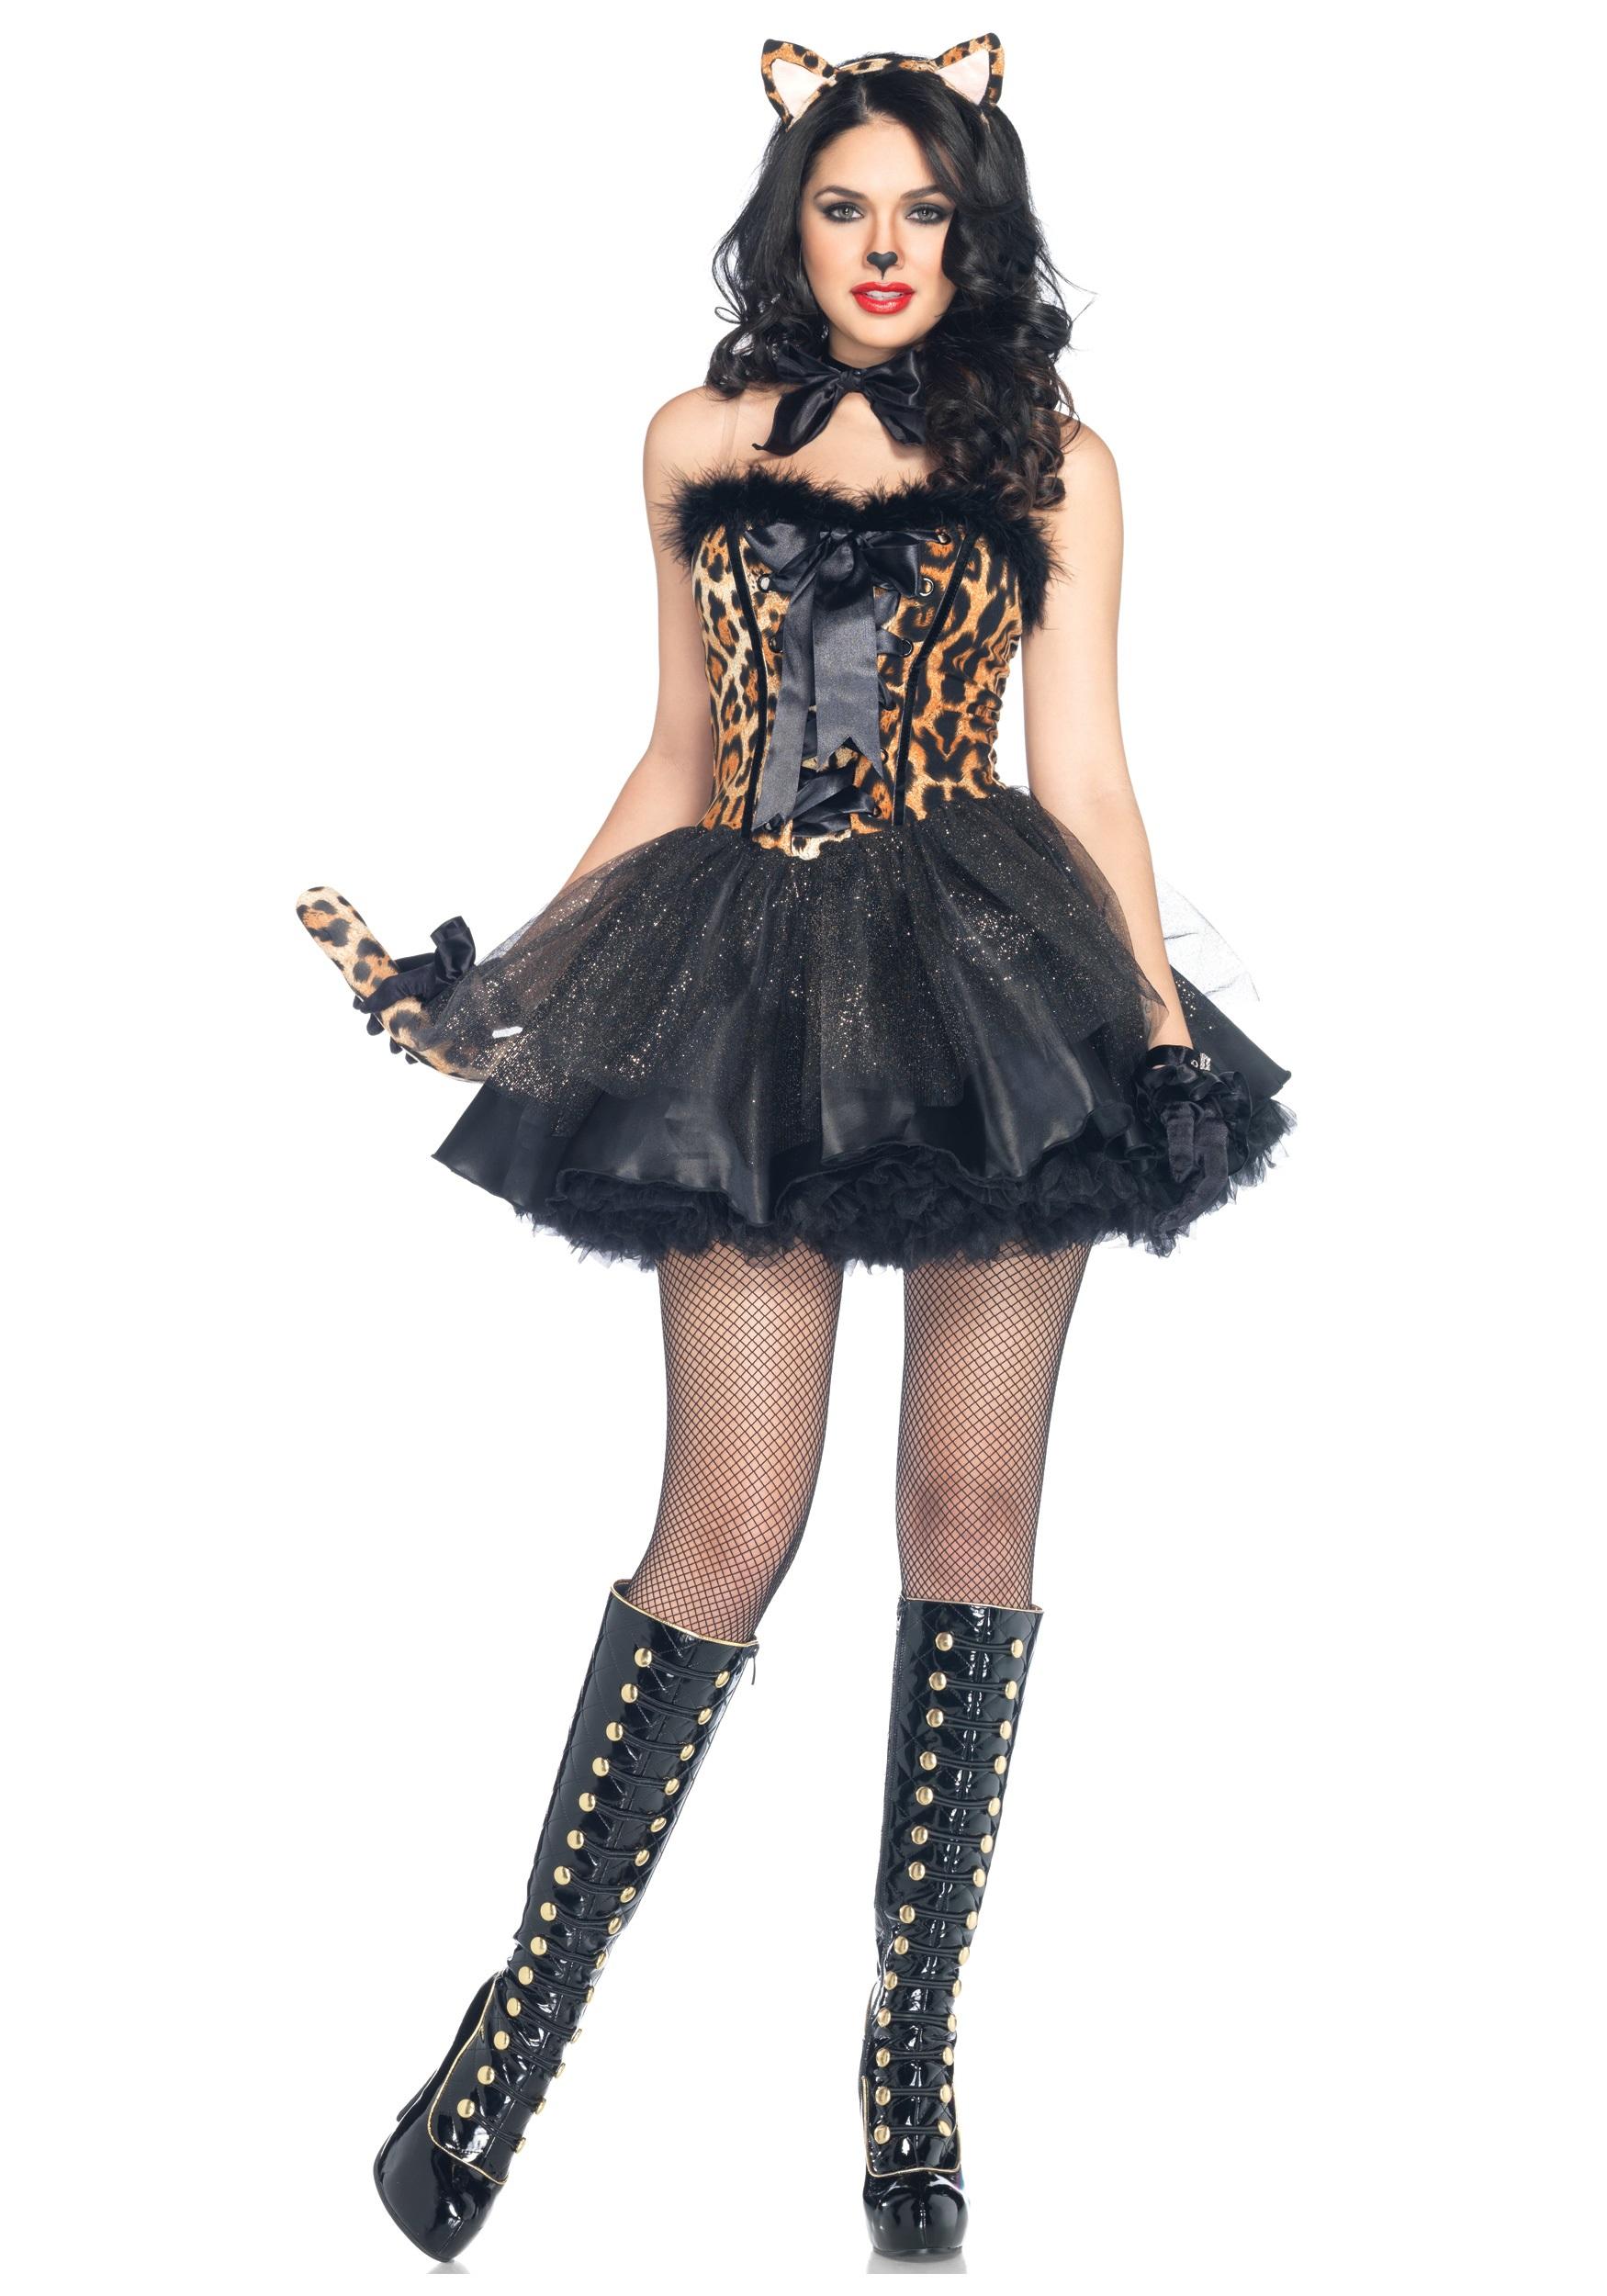 Luxe Leopard Costume  sc 1 st  Halloween Costumes & Luxe Leopard Costume - Halloween Costumes